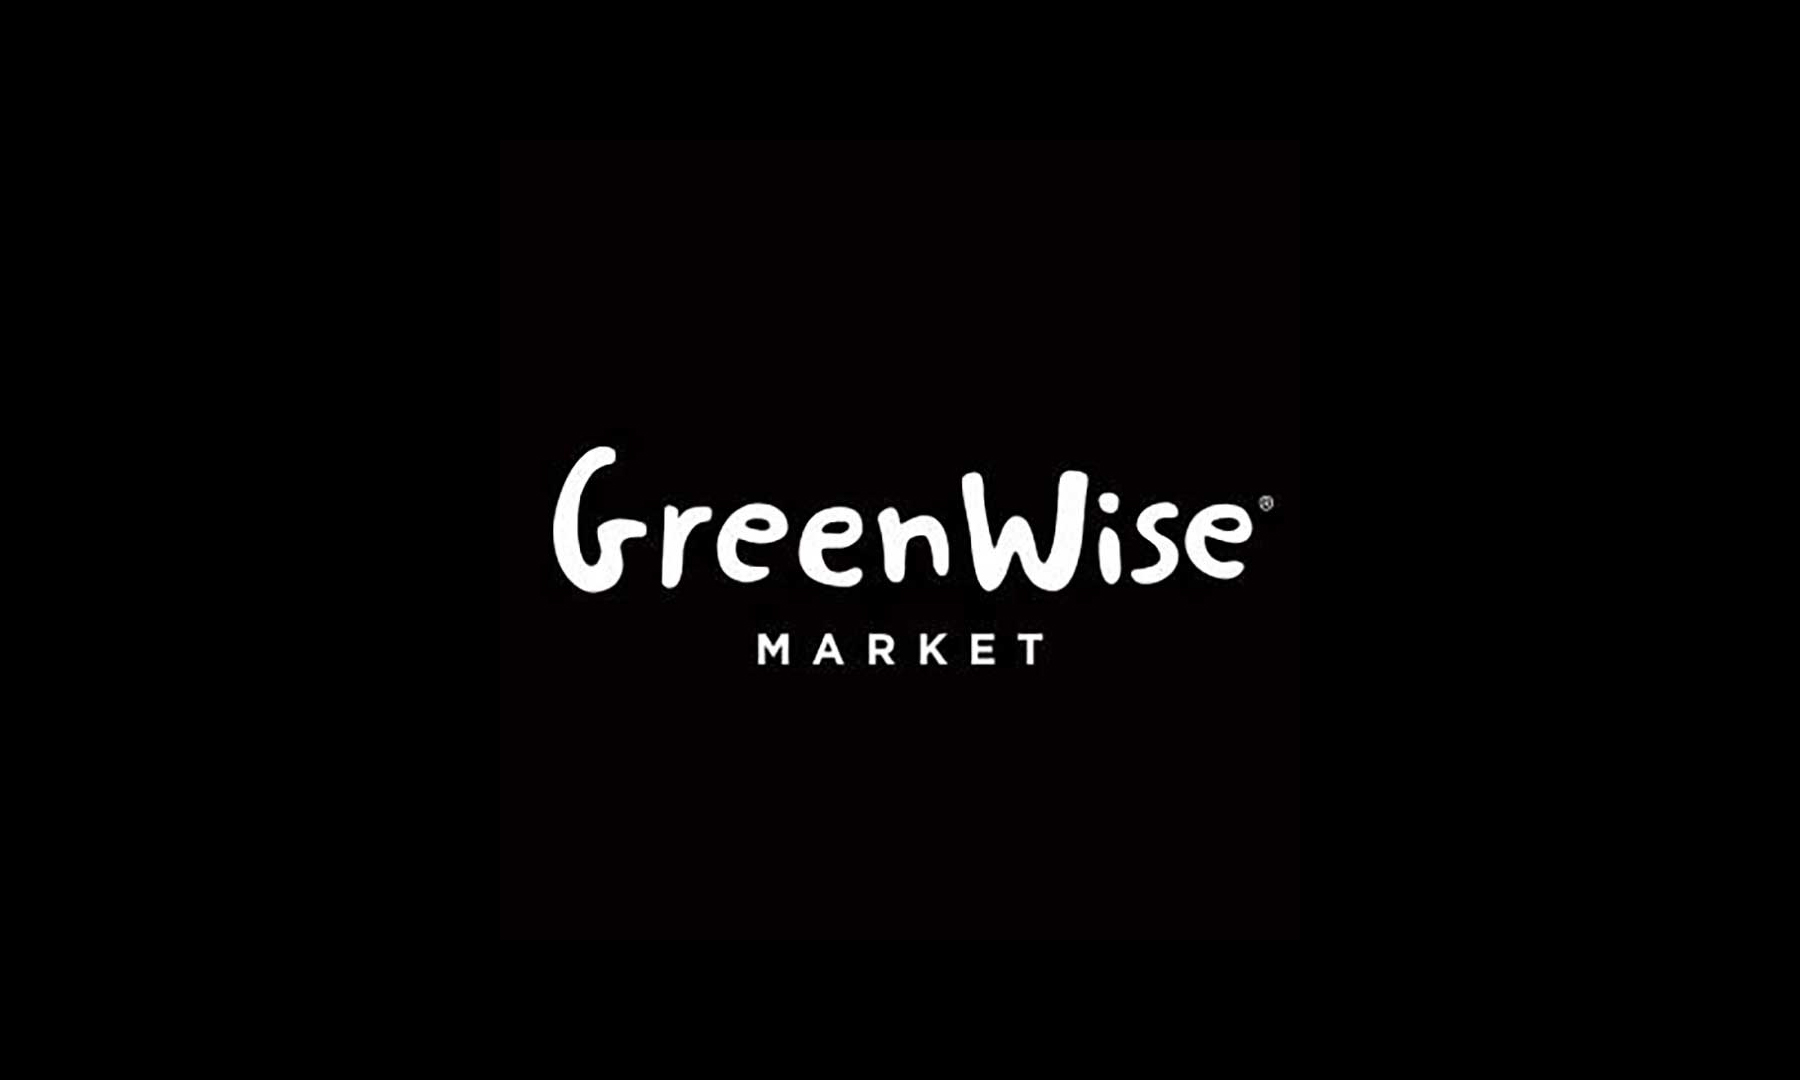 Publix Bringing GreenWise Market To Marietta, Georgia